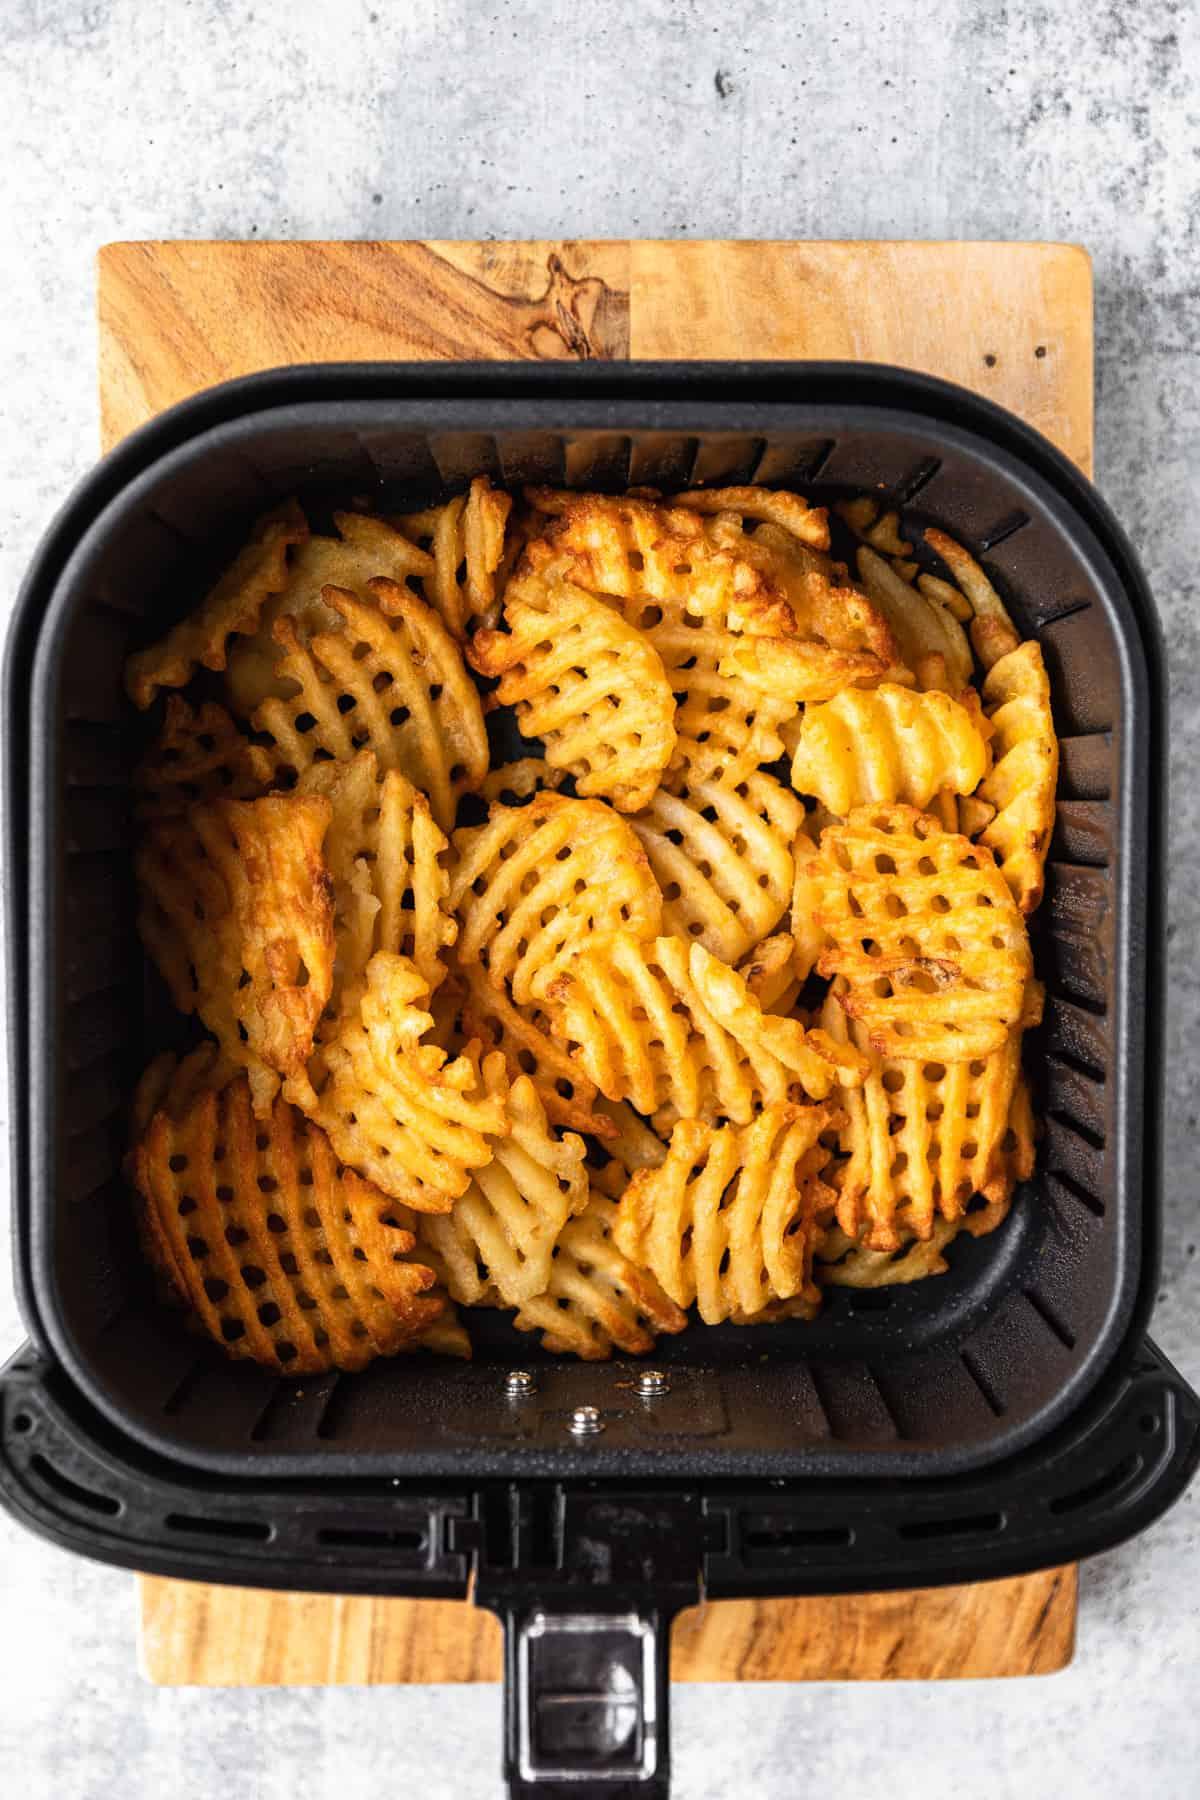 golden brown waffle fries in an air fryer basket